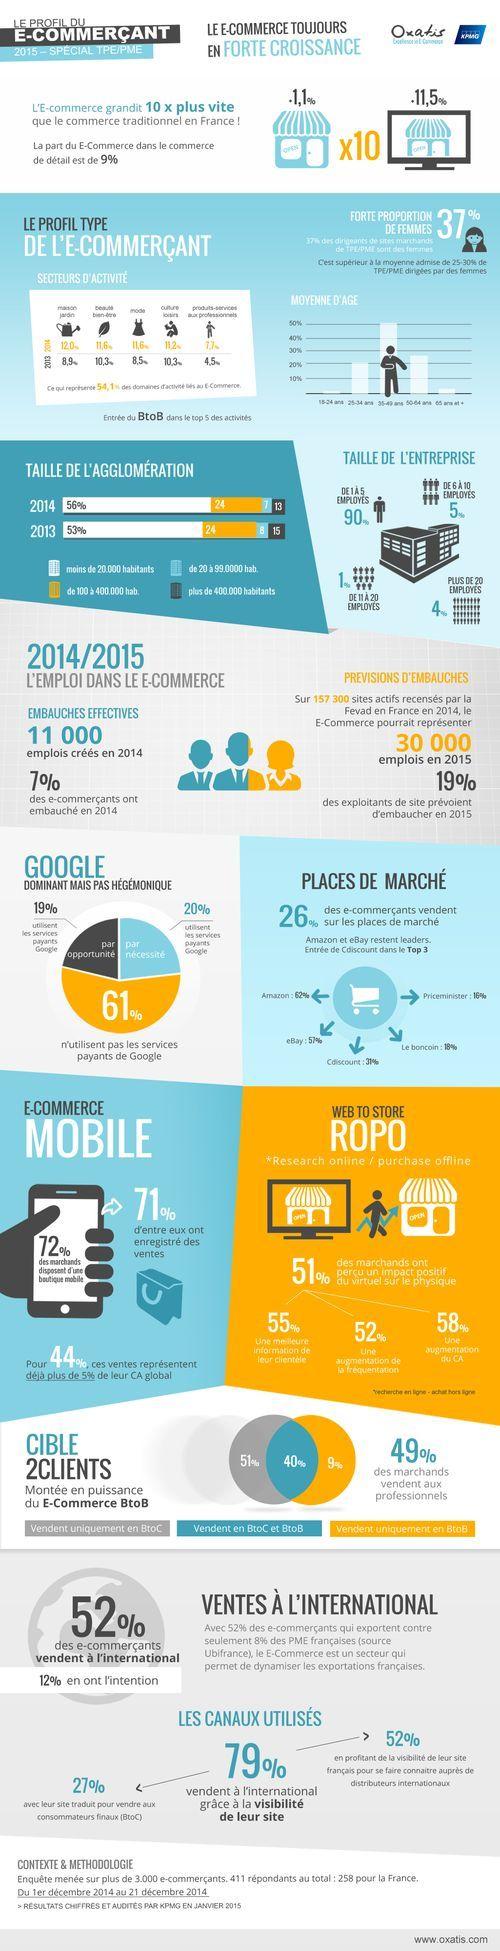 infographie-oxatis.jpg (500×1951)